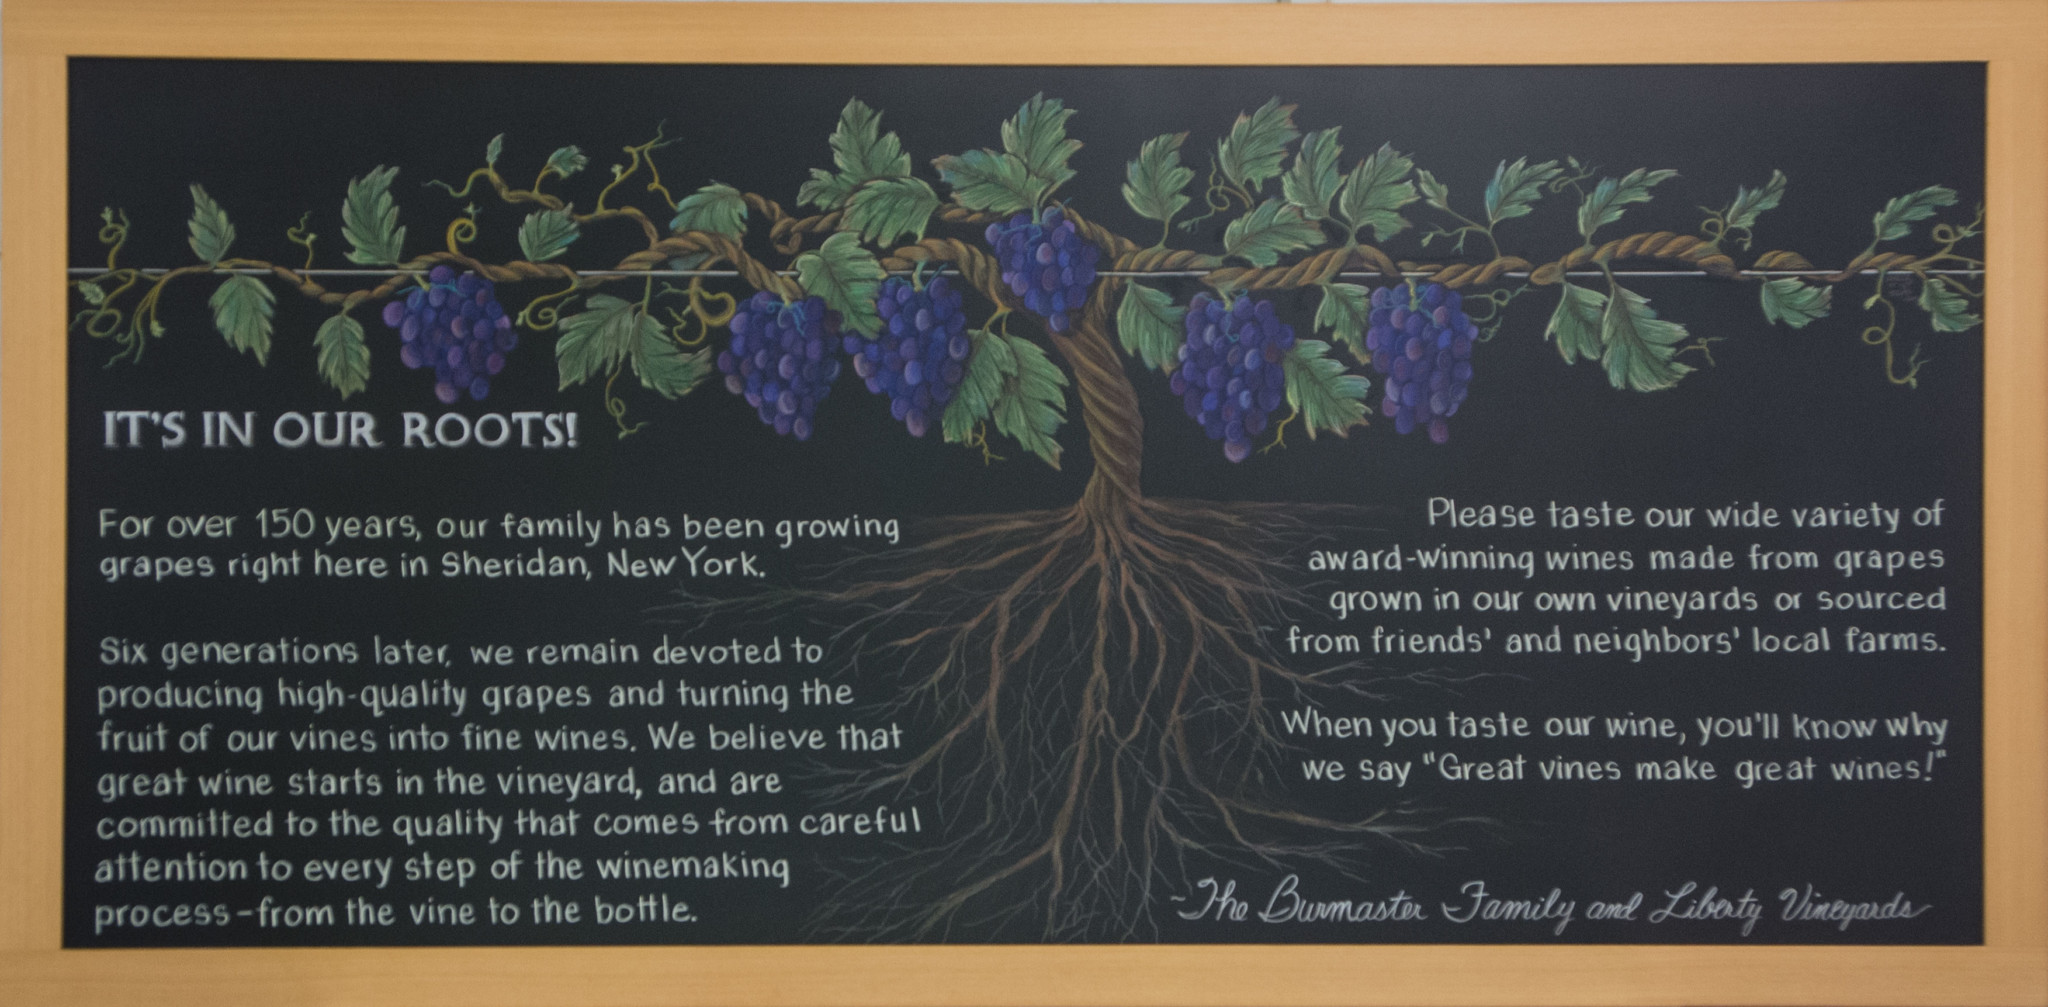 Vineyard Chalkboard Sheridan New York, LIberty Vineyards, roots, vineyard, Sheridan, New York, Chalkboard, story, winery award, wine, grapevine, typography, chalk illustration, story